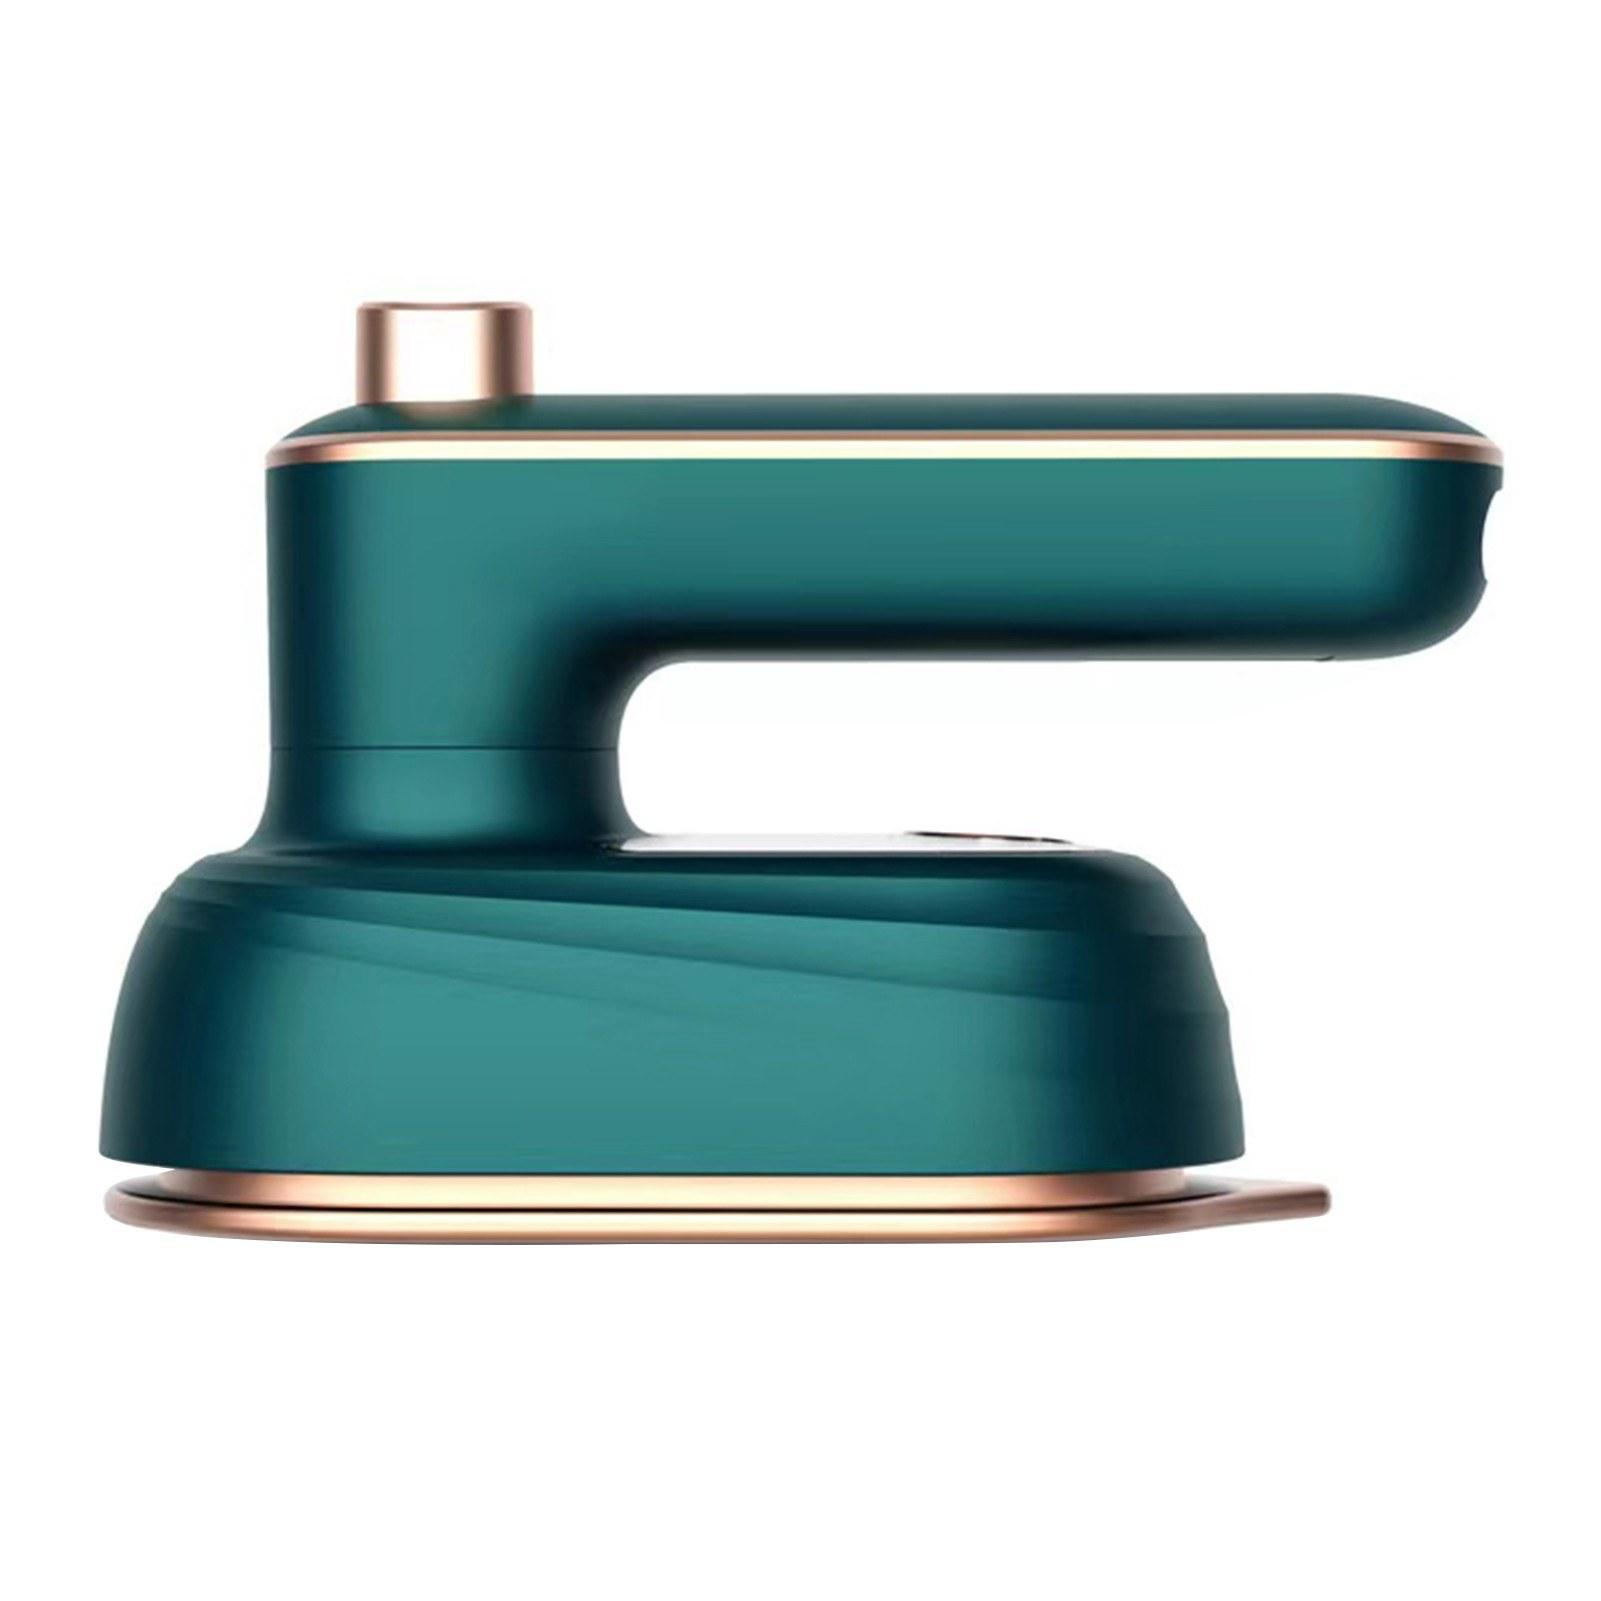 Tomtop - 58% OFF Portable Mini Steam Iron Handheld Lightweight Garment Steamer, $19.19 (Inclusive of VAT)